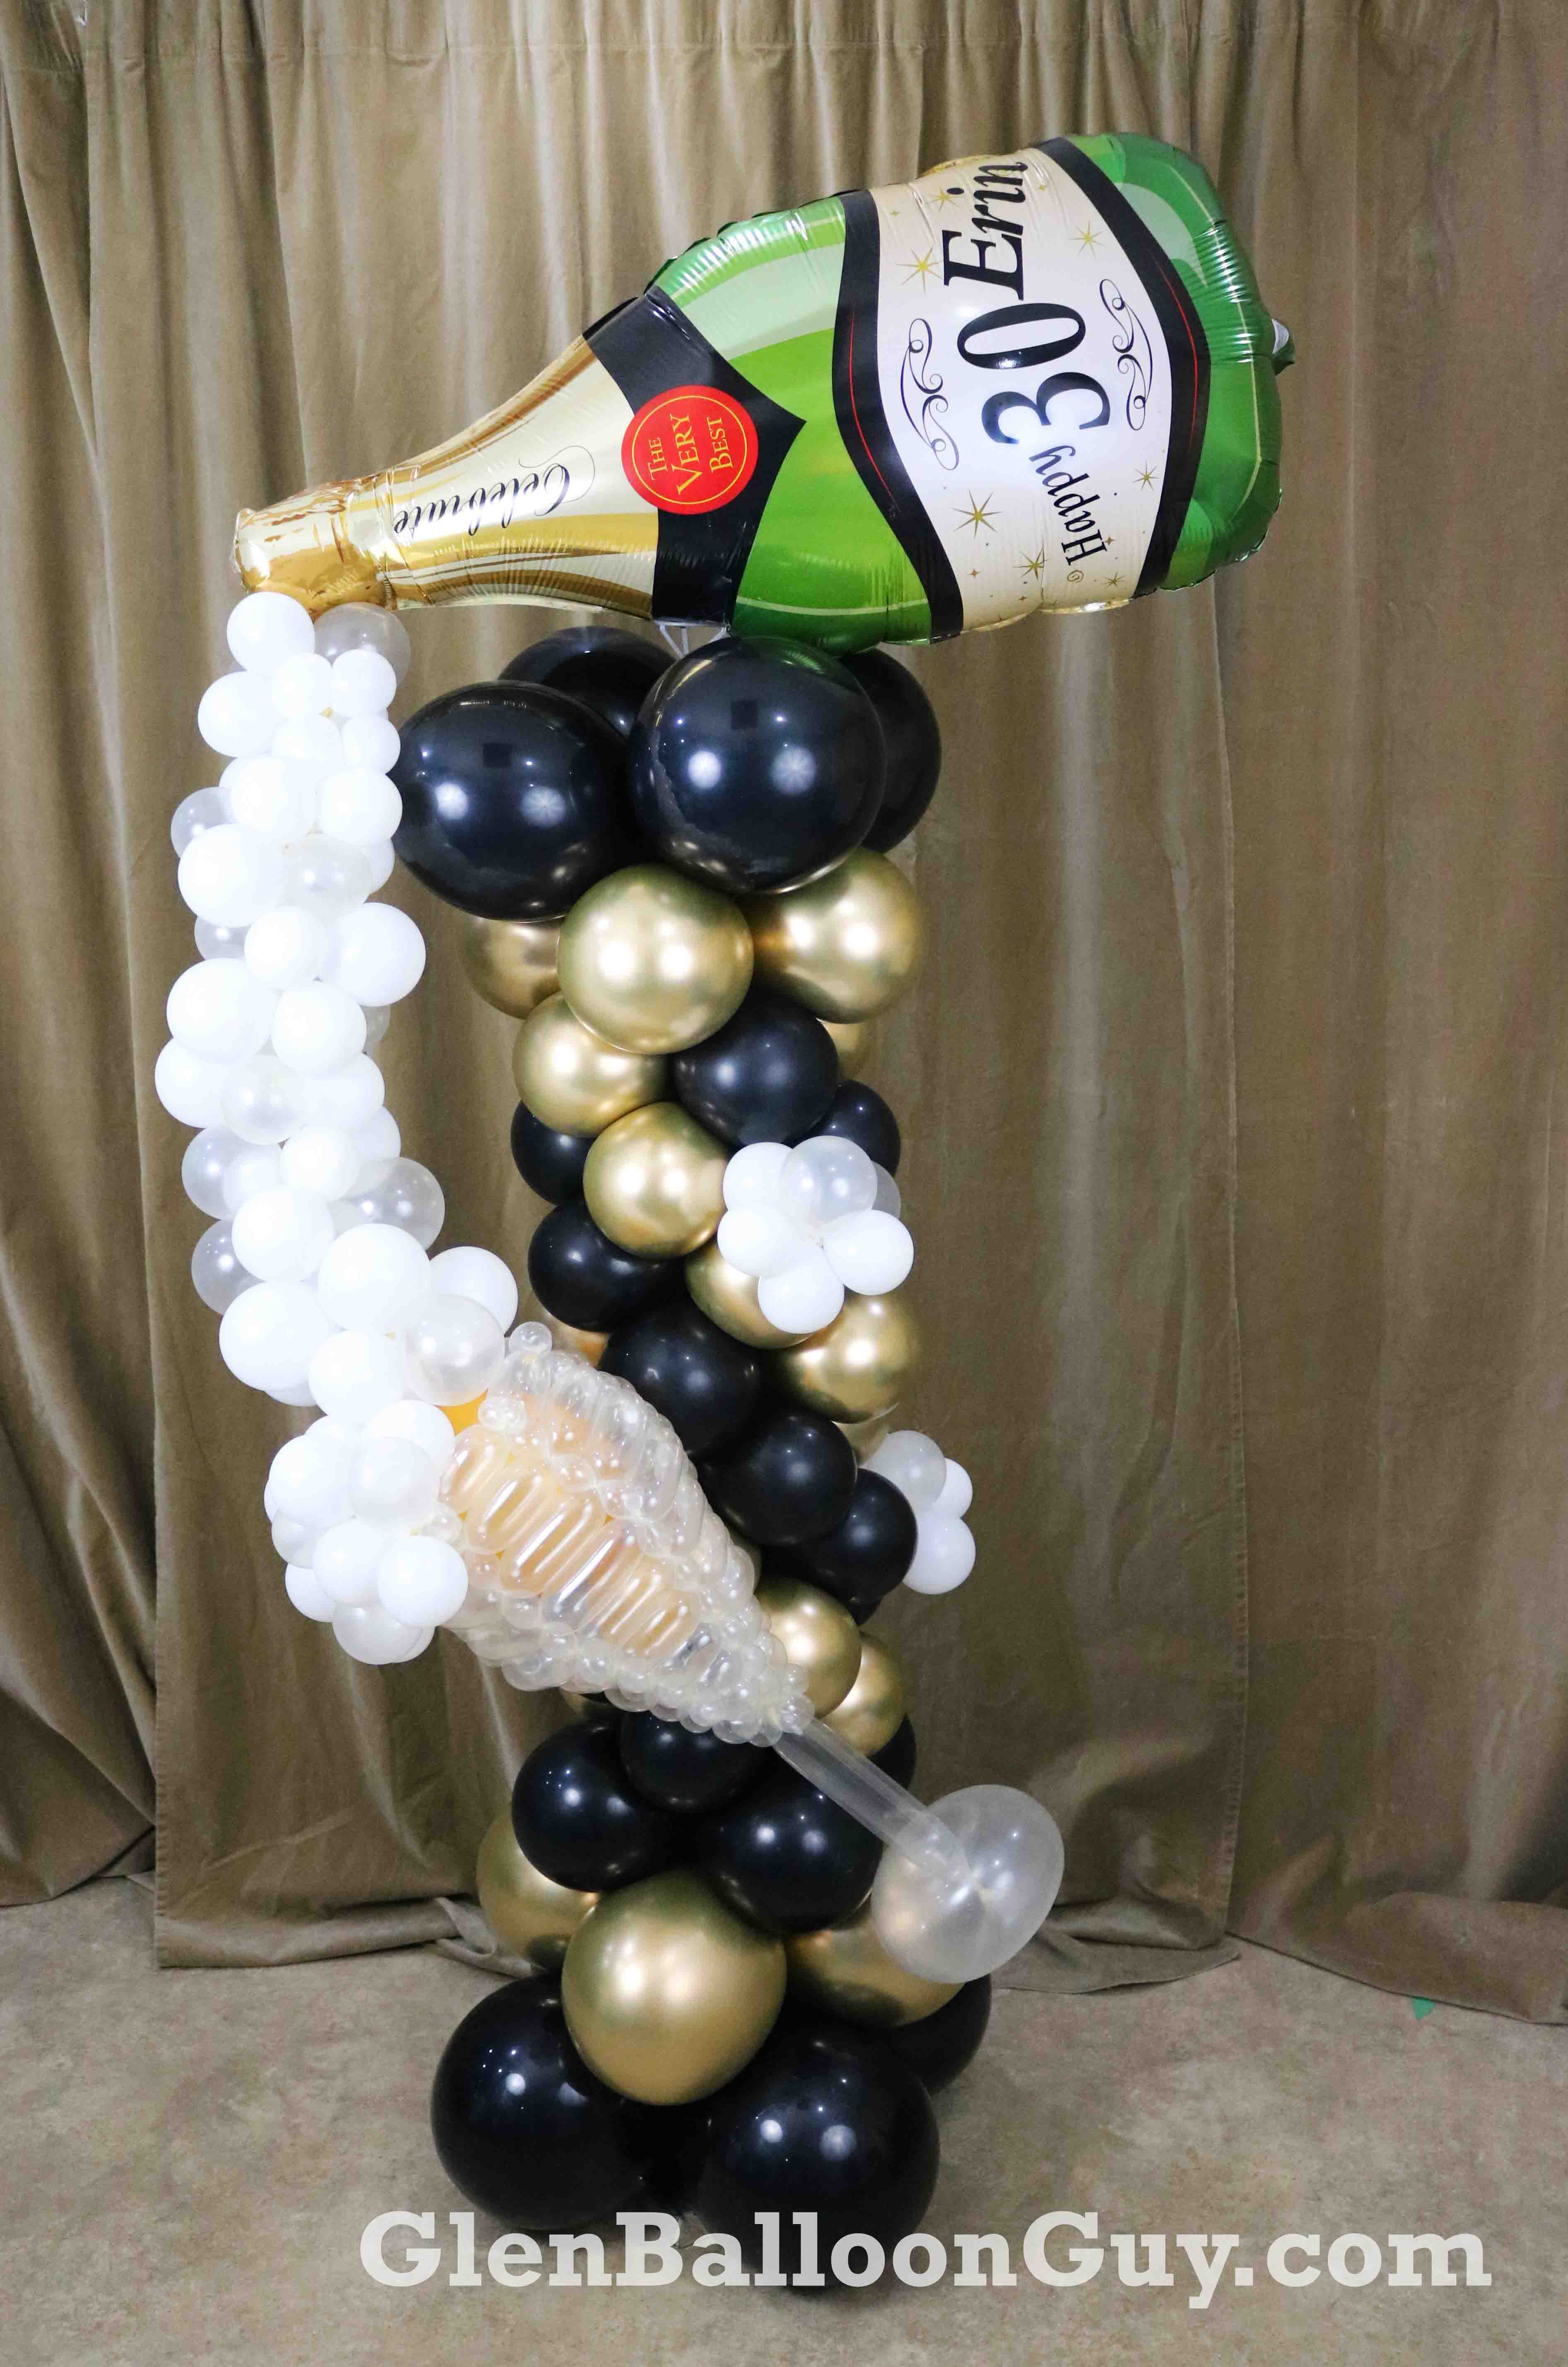 Champagne_Column_balloon_sculpture